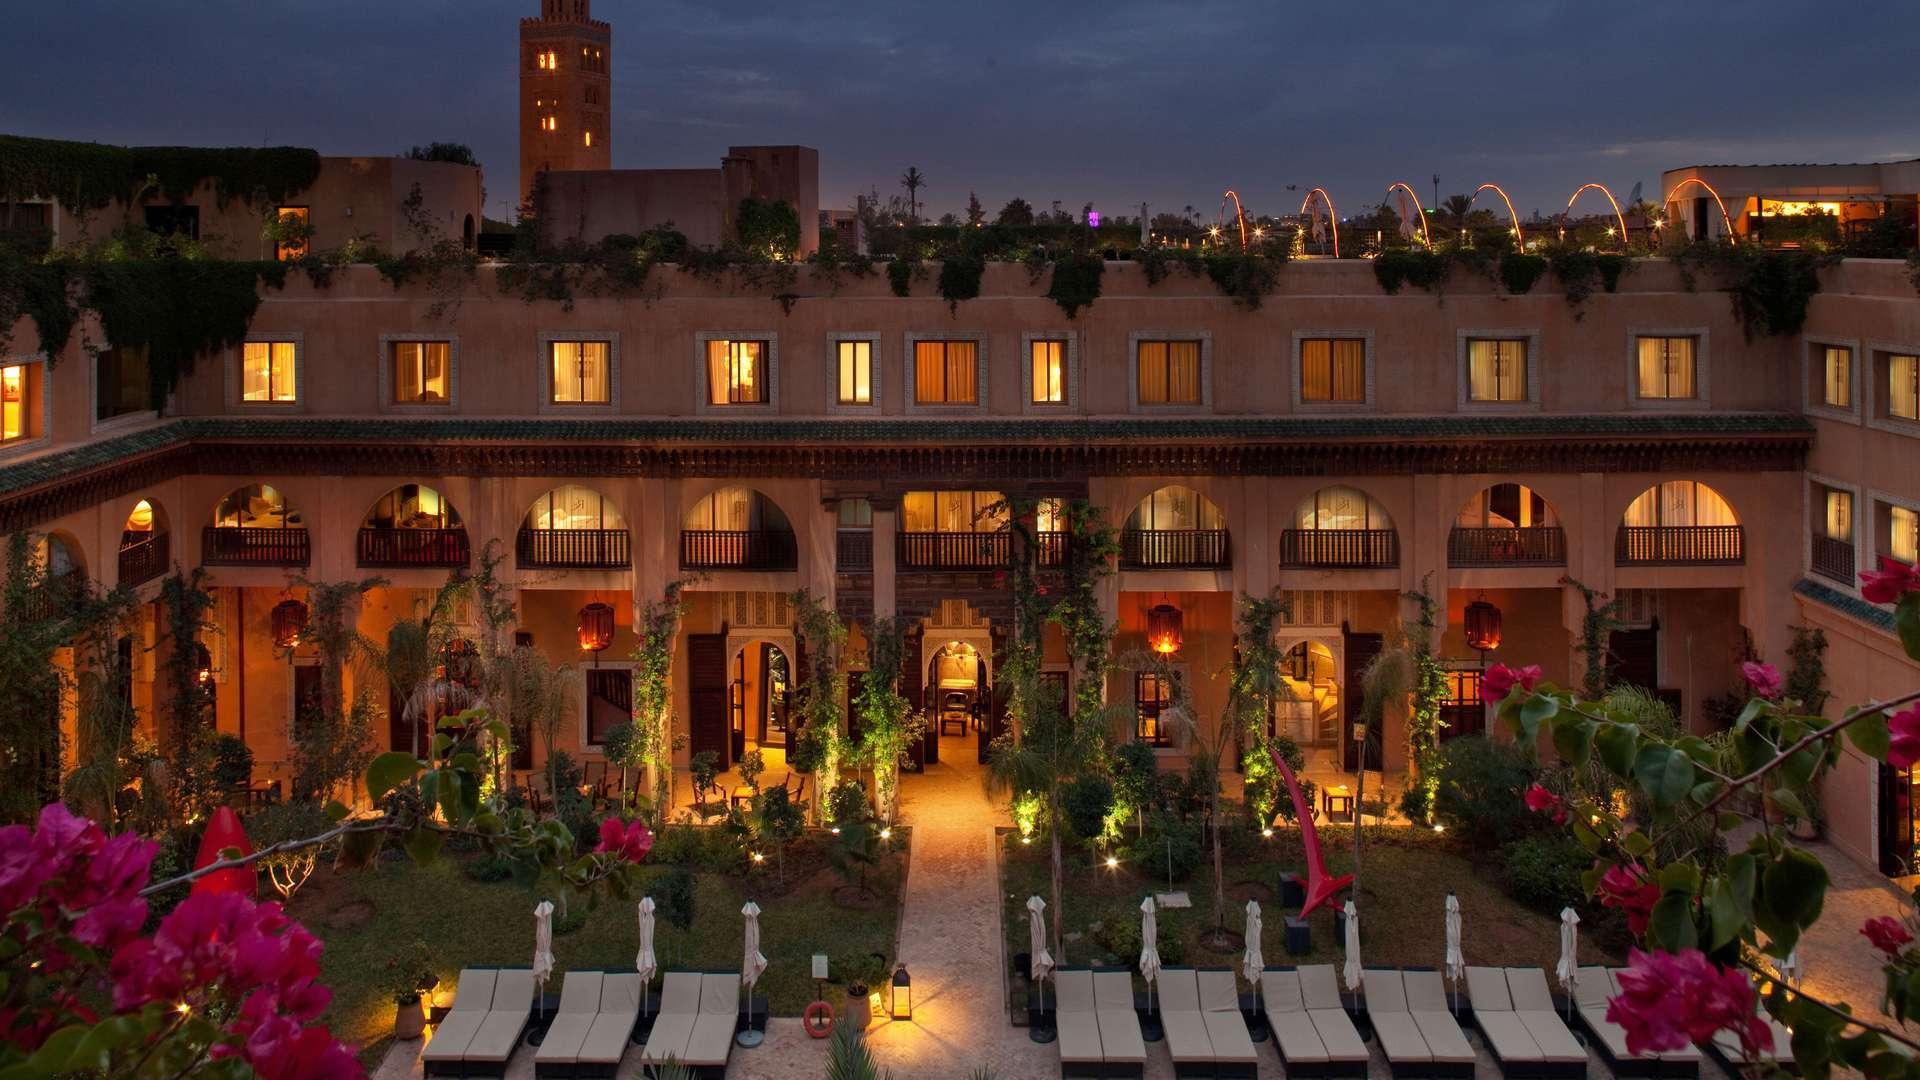 Les Jardins De La Koutoubia | A Kuoni Hotel In Marrakech serapportantà Jardin De La Koutoubia